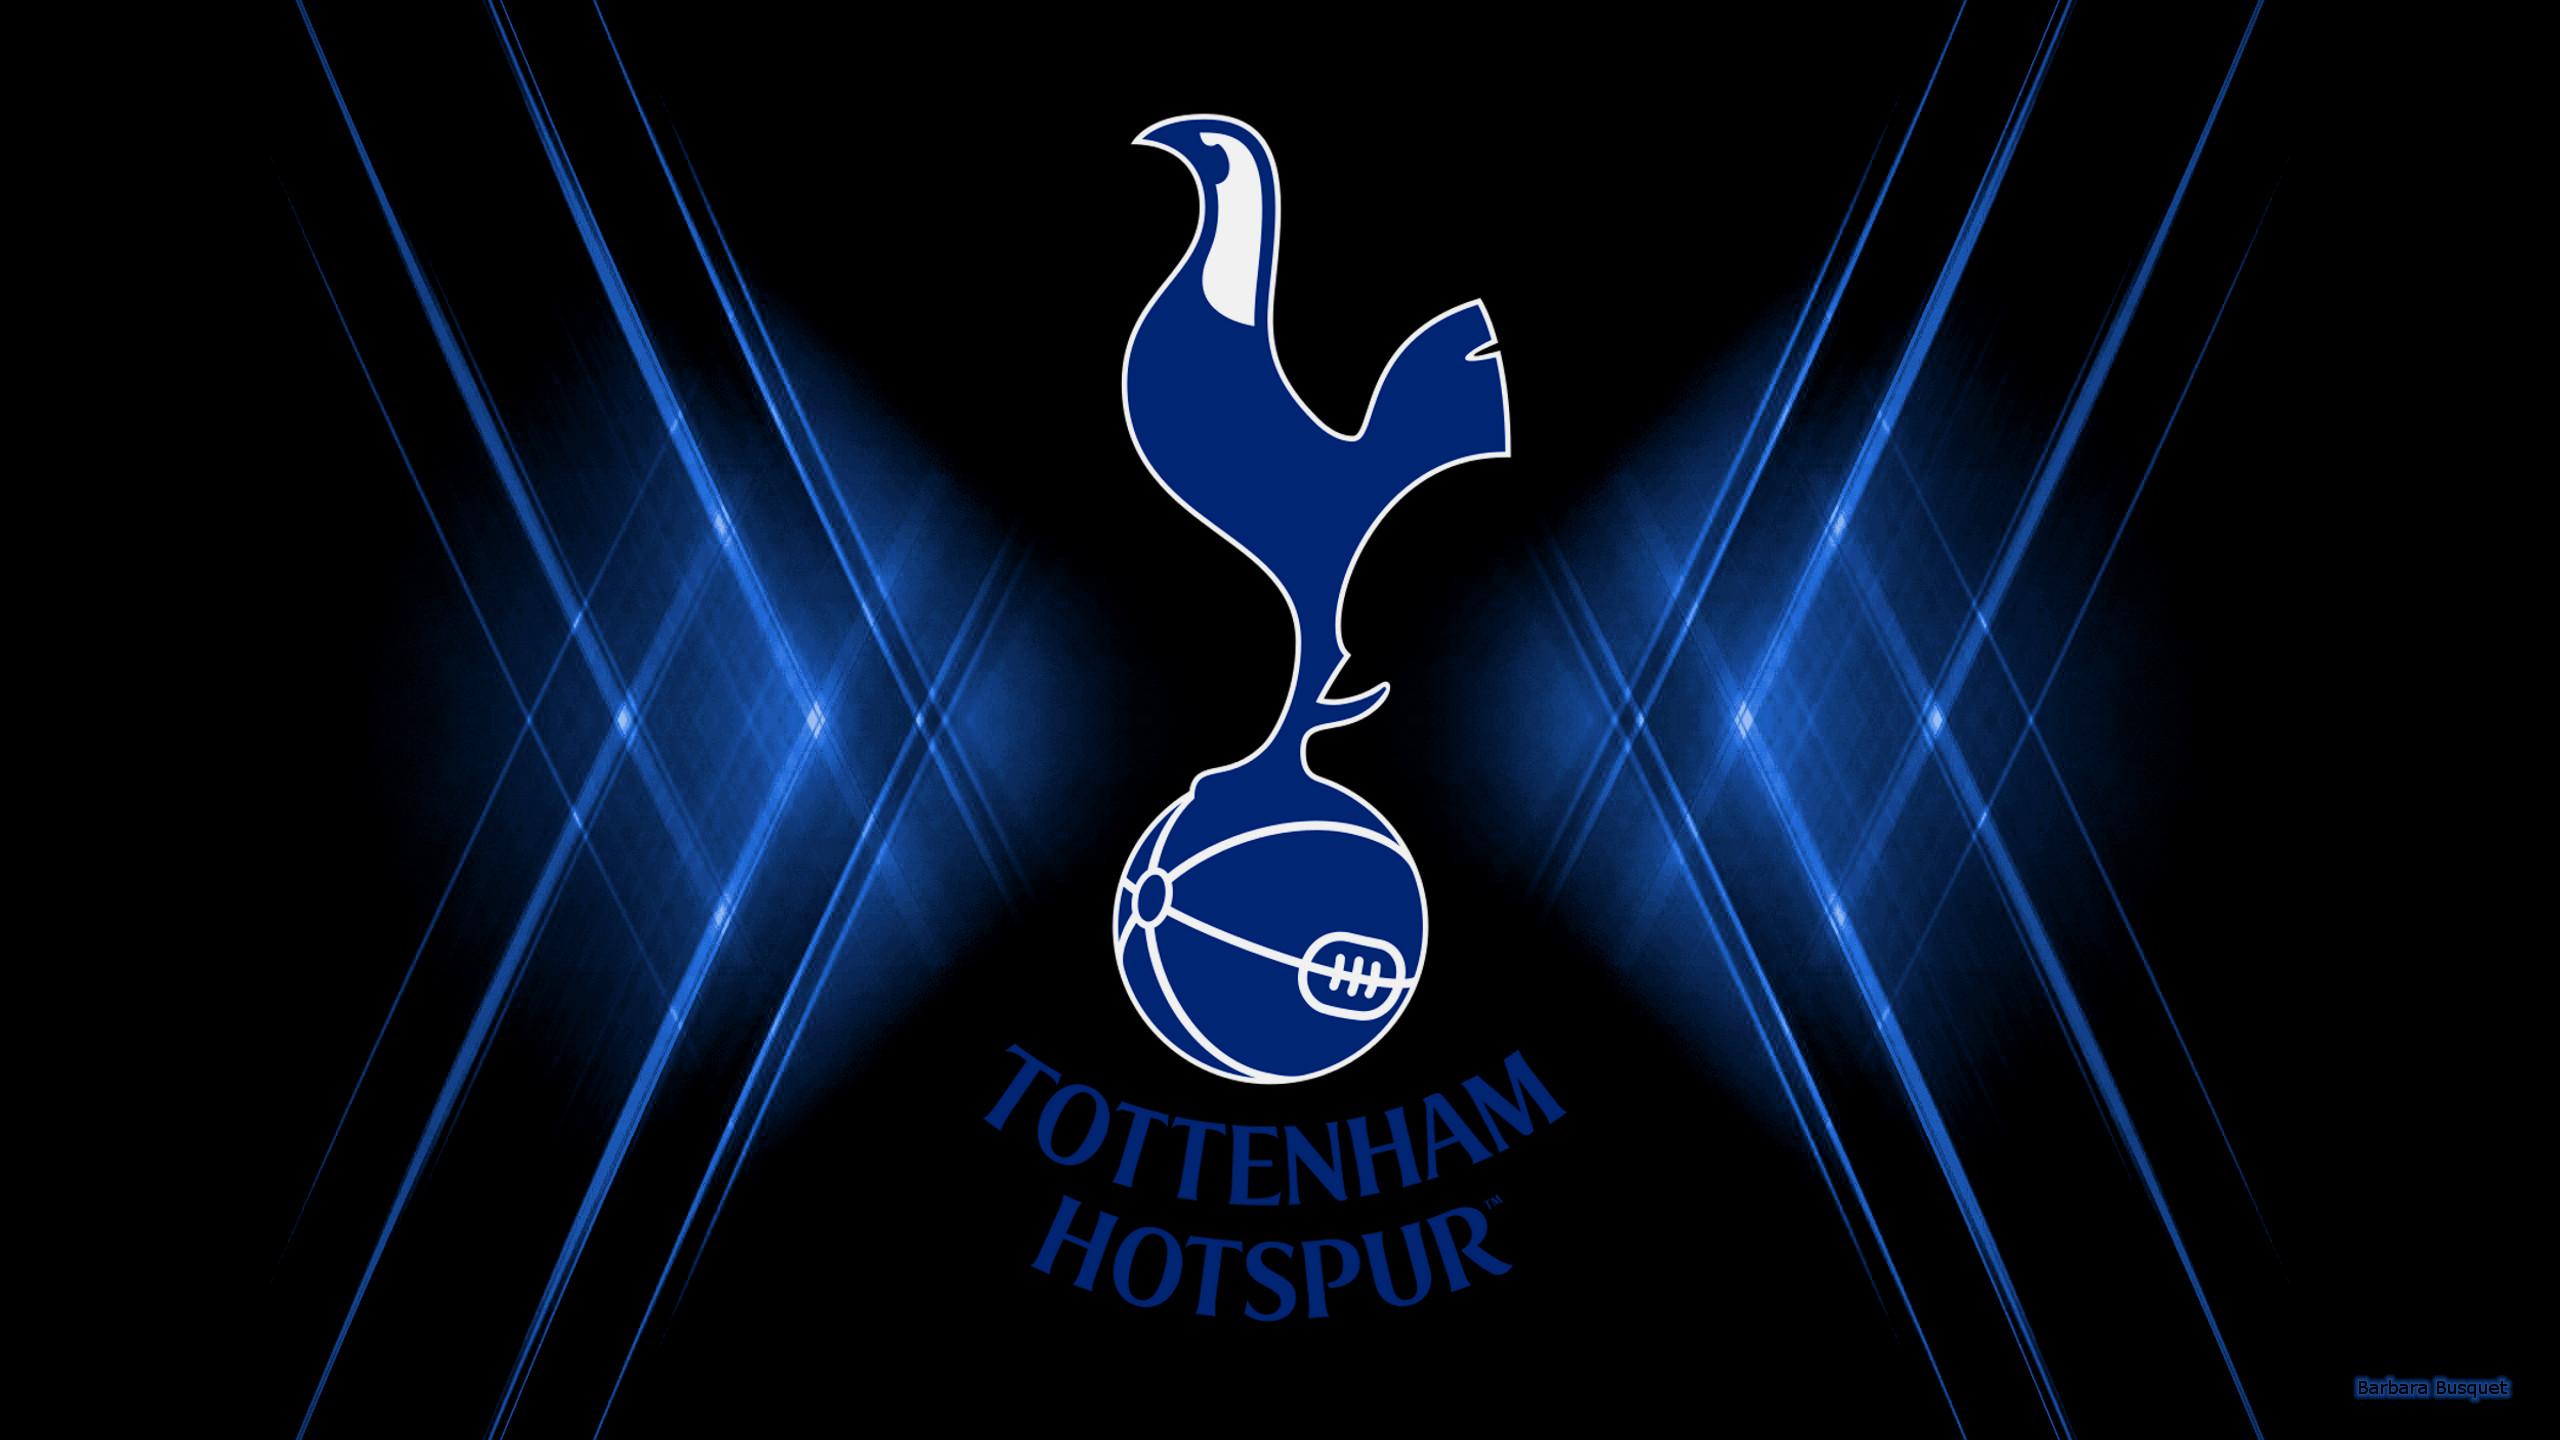 Tottenham Hotspur Wallpapers 2560x1440